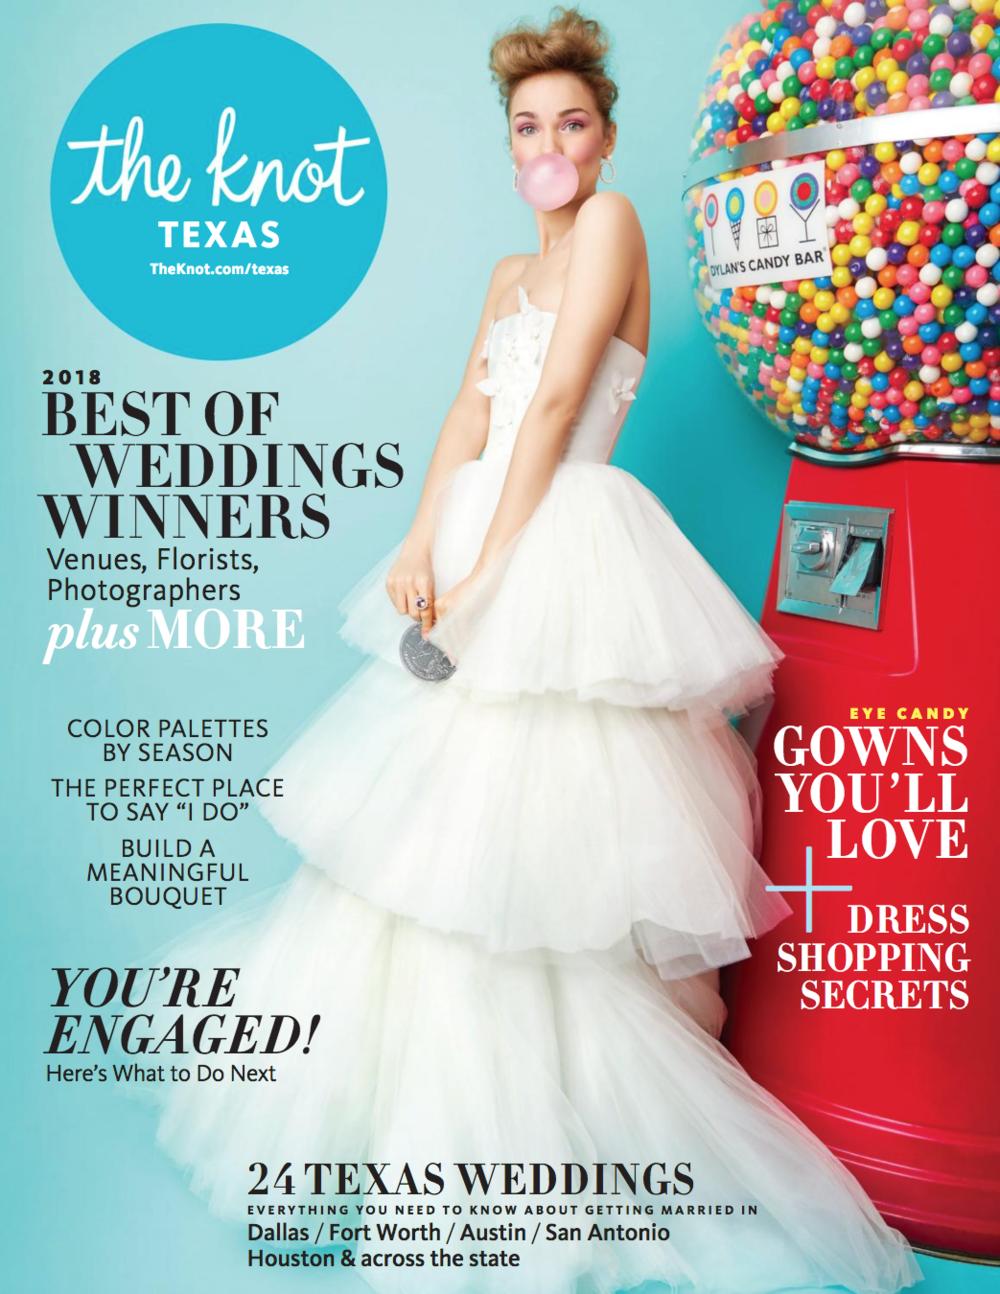 The-Knot-Texas-Fine-Art-Wedding-Film-Destination-Photographer-Houston-Austin-Dallas-New-Orleans-Julia-Ideson-Library-Event-Dana-Josh-Fernandez-Photograph-Top-Best-14848.png